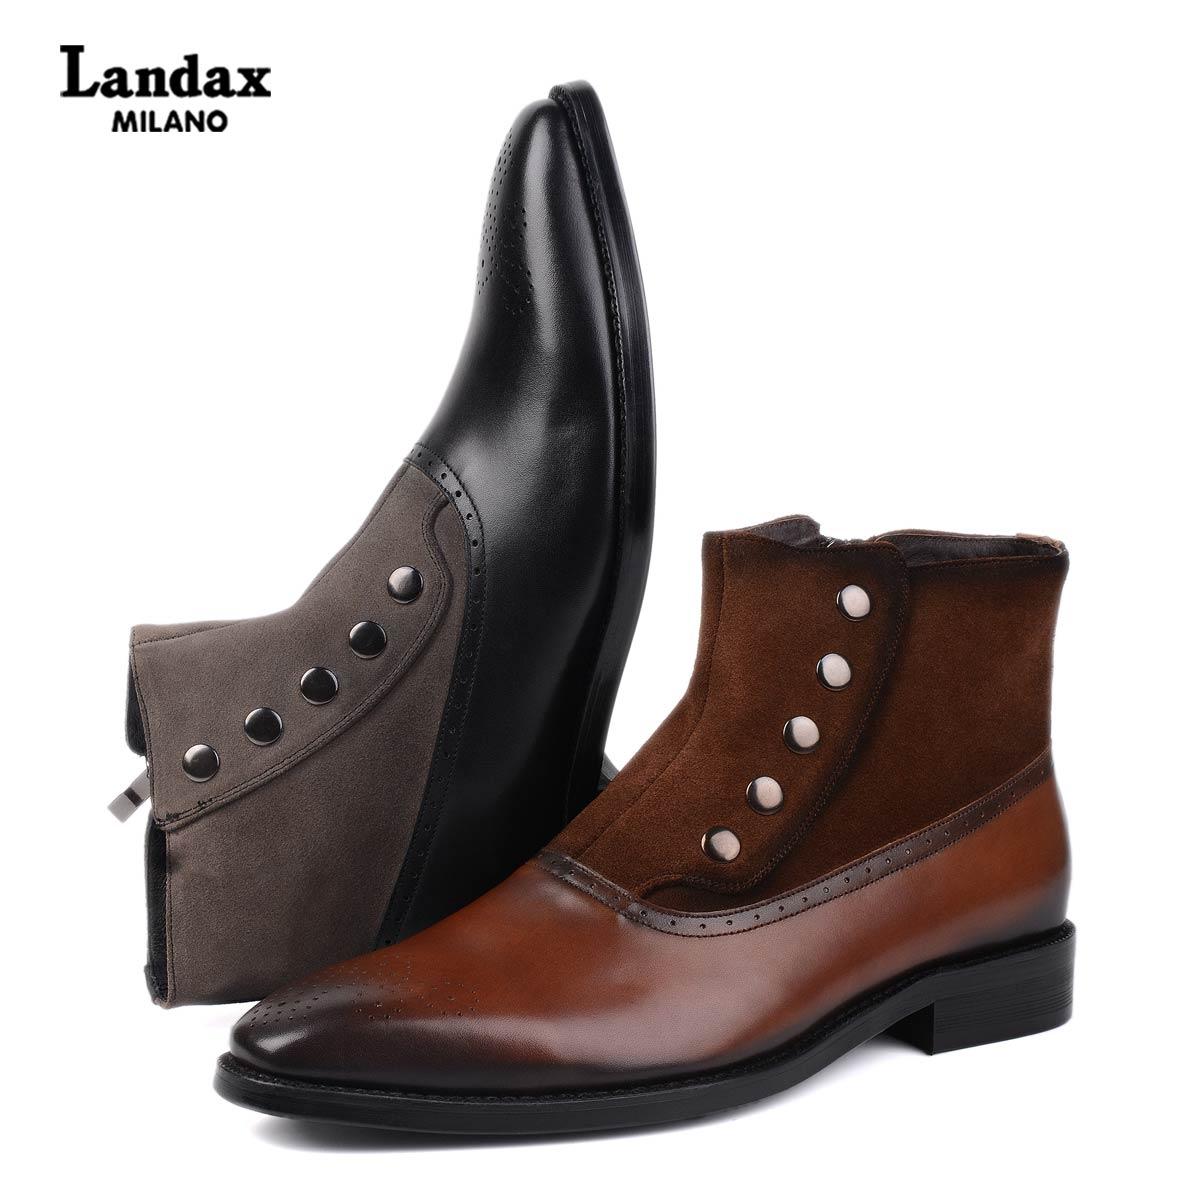 Landax秋季新款牛皮手工商务男靴英伦时尚布洛克短靴拉链切尔西靴